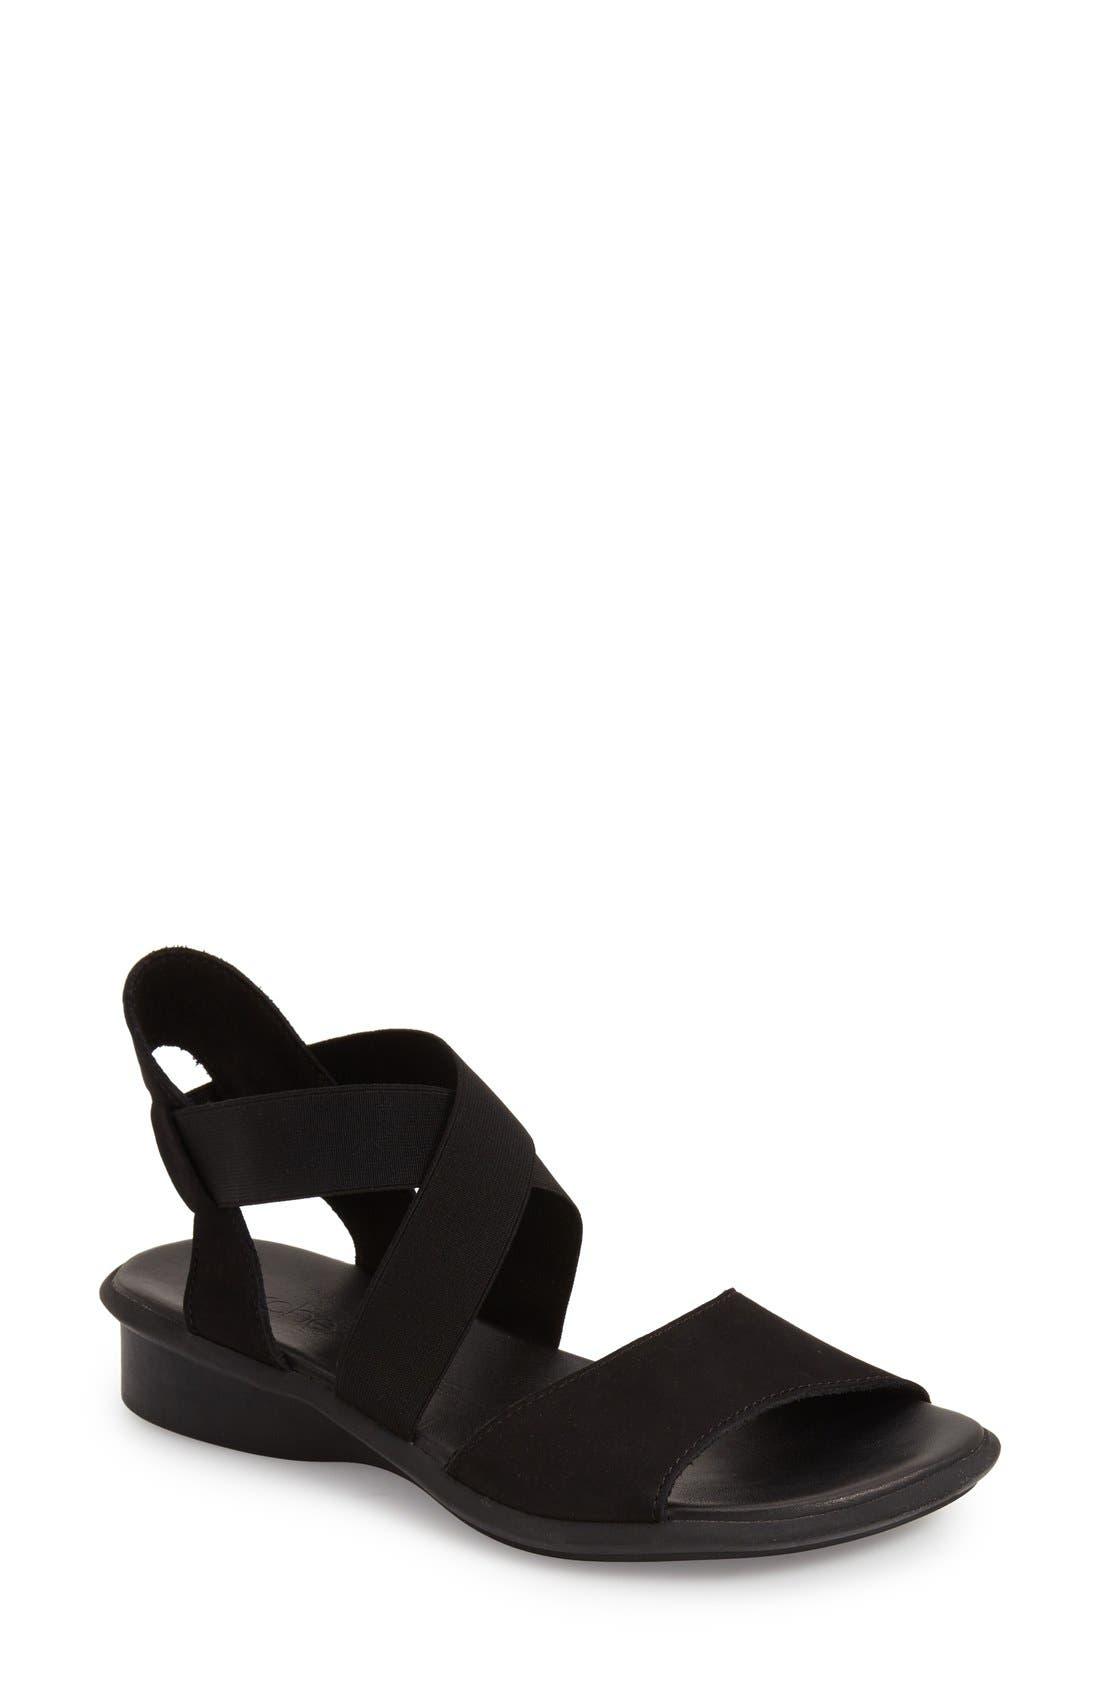 'Satia' Sandal,                         Main,                         color, BLACK NUBUCK LEATHER